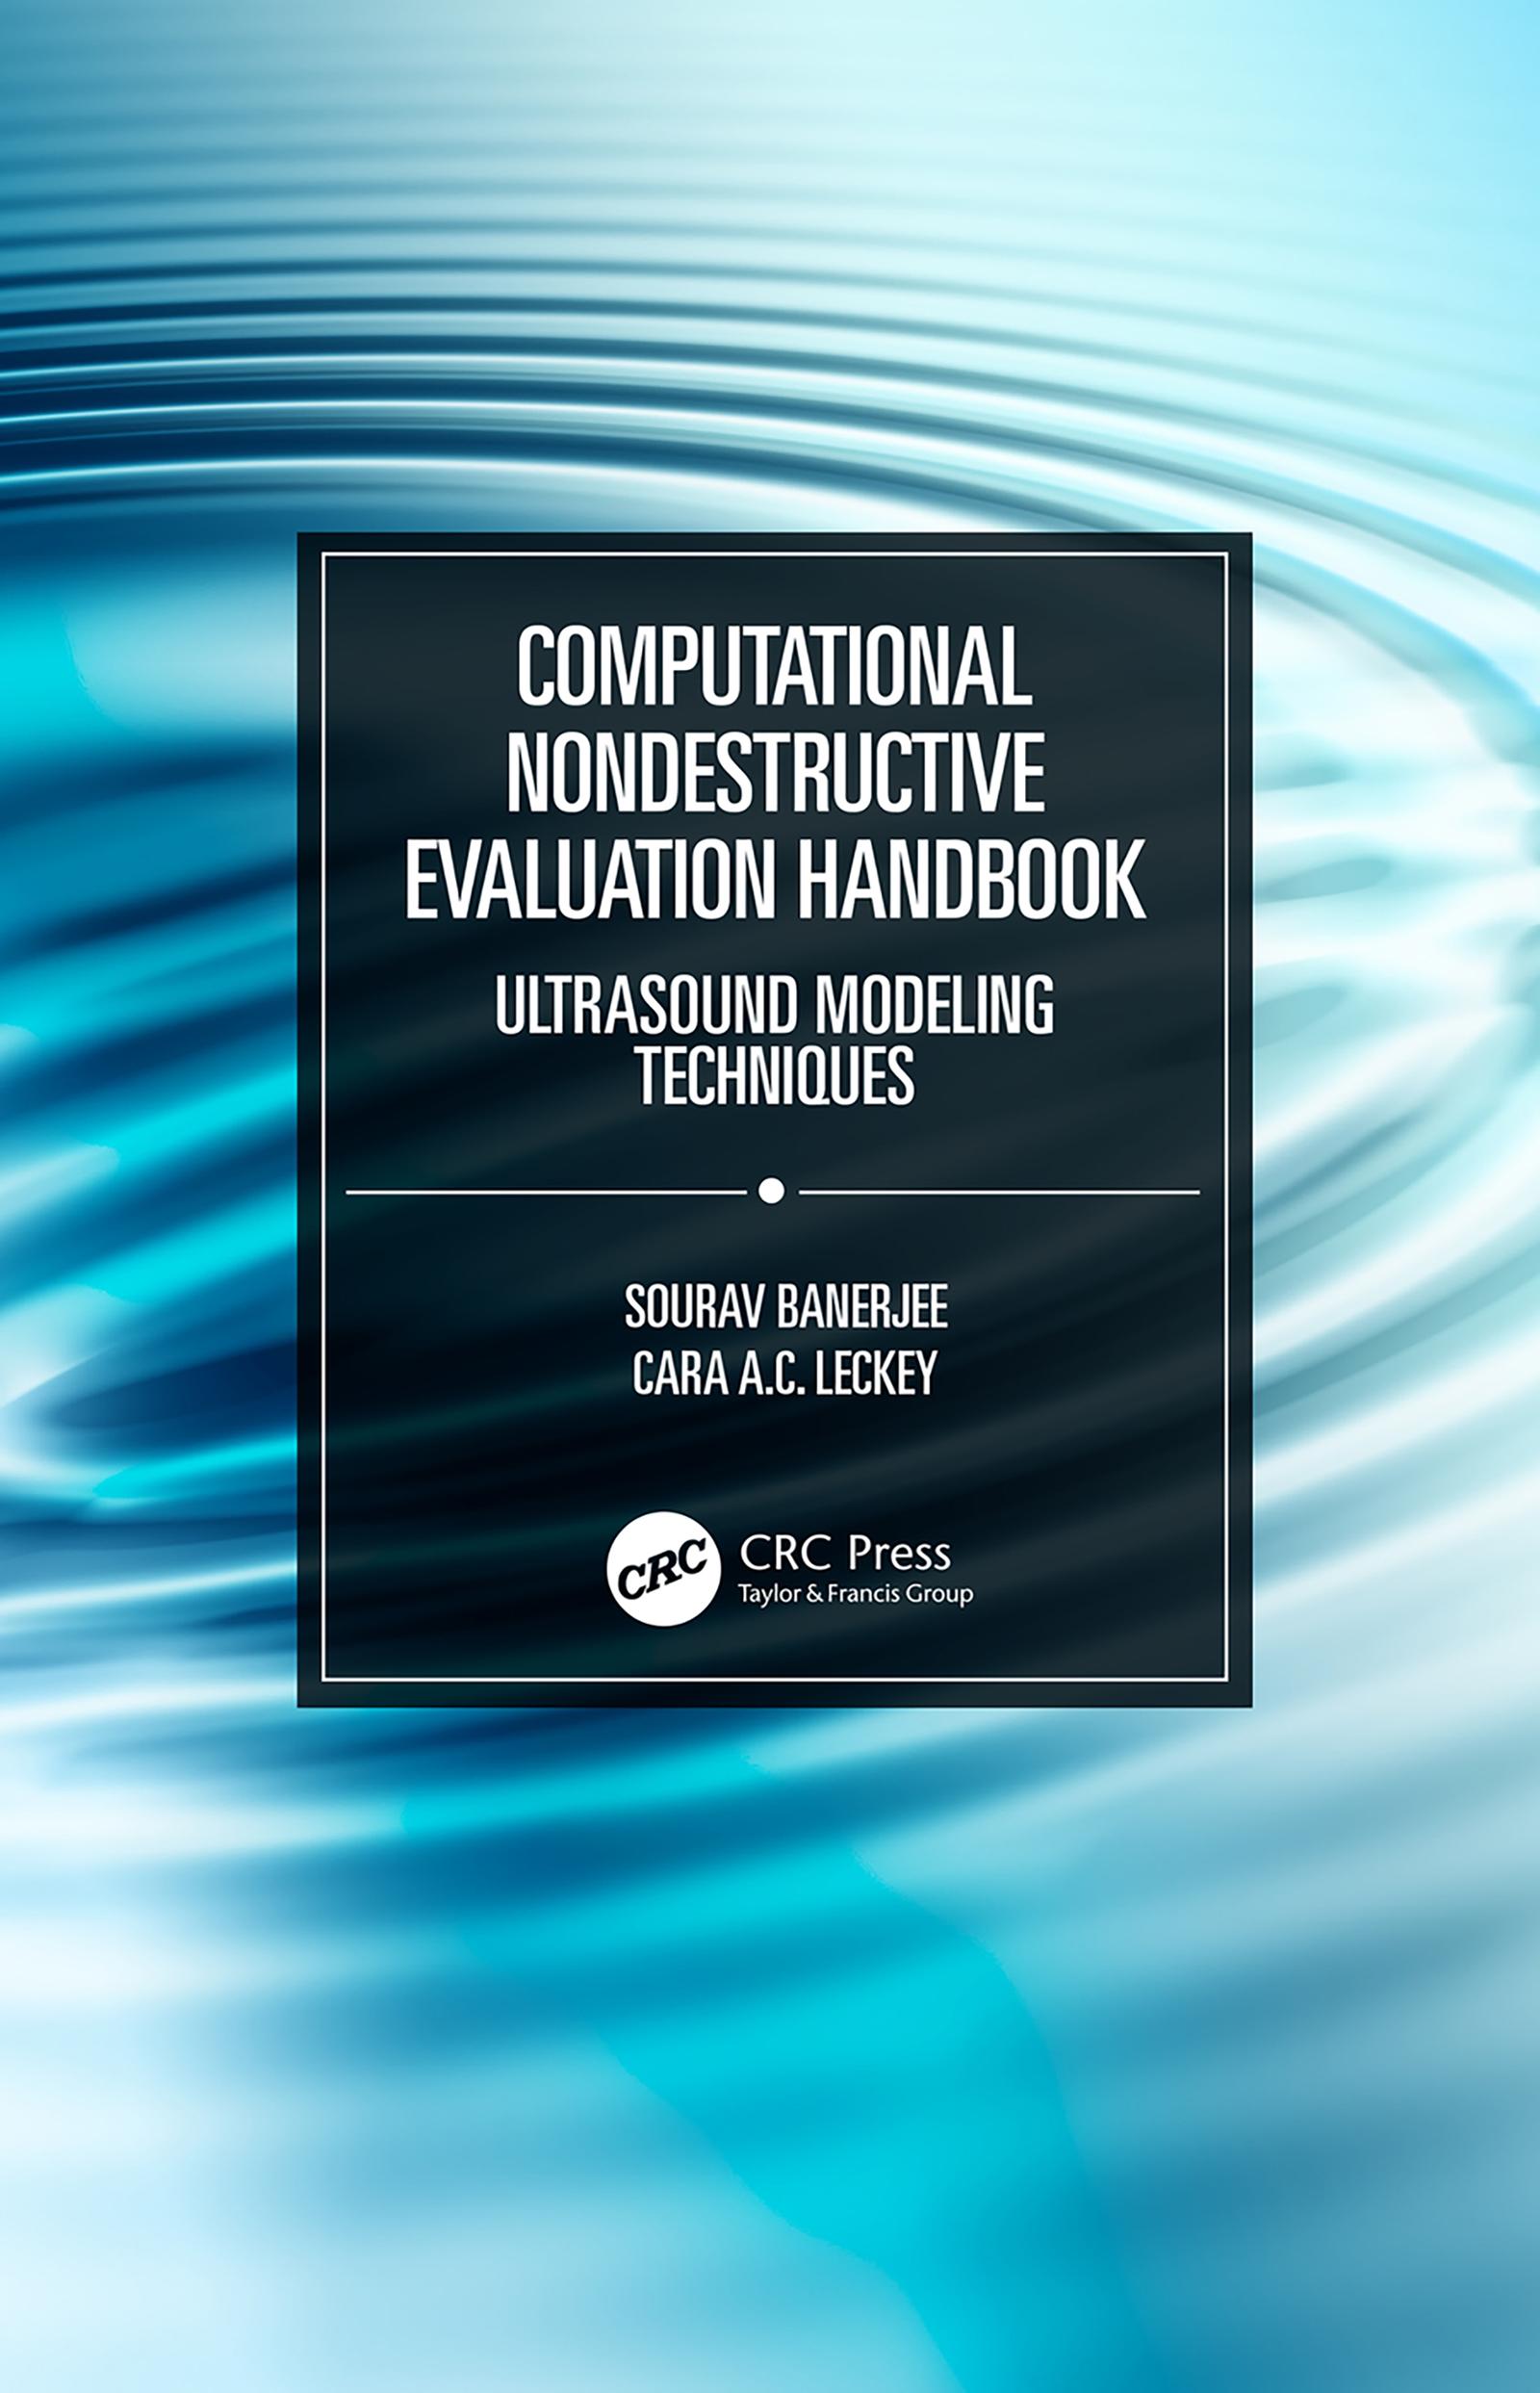 Computational Nondestructive Evaluation Handbook